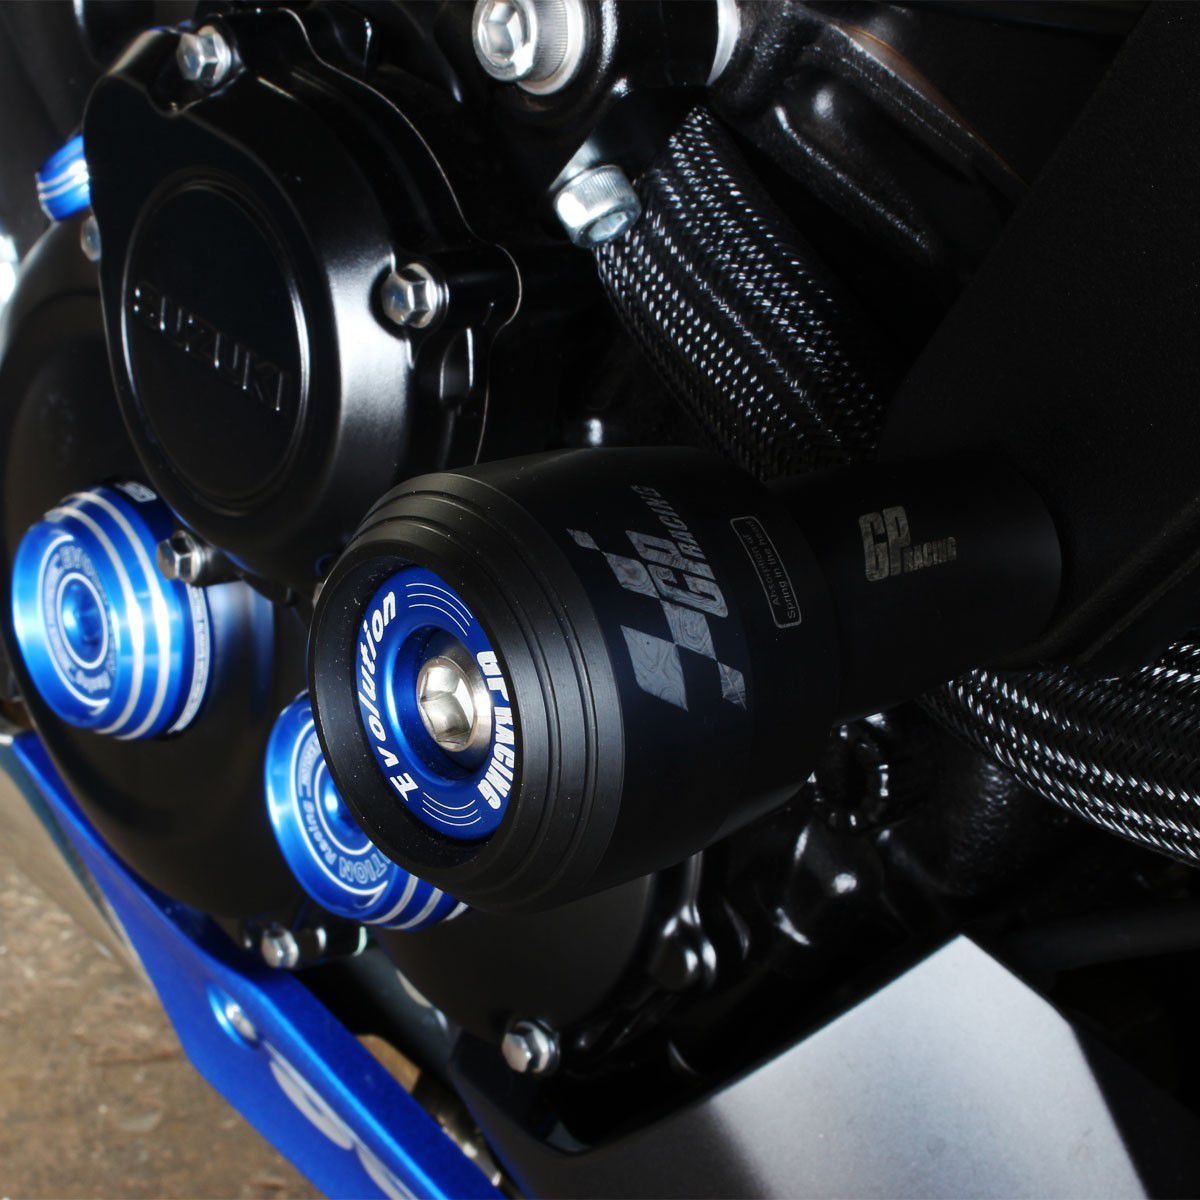 Slider Suzuki Versys 1000 Versys1000 12